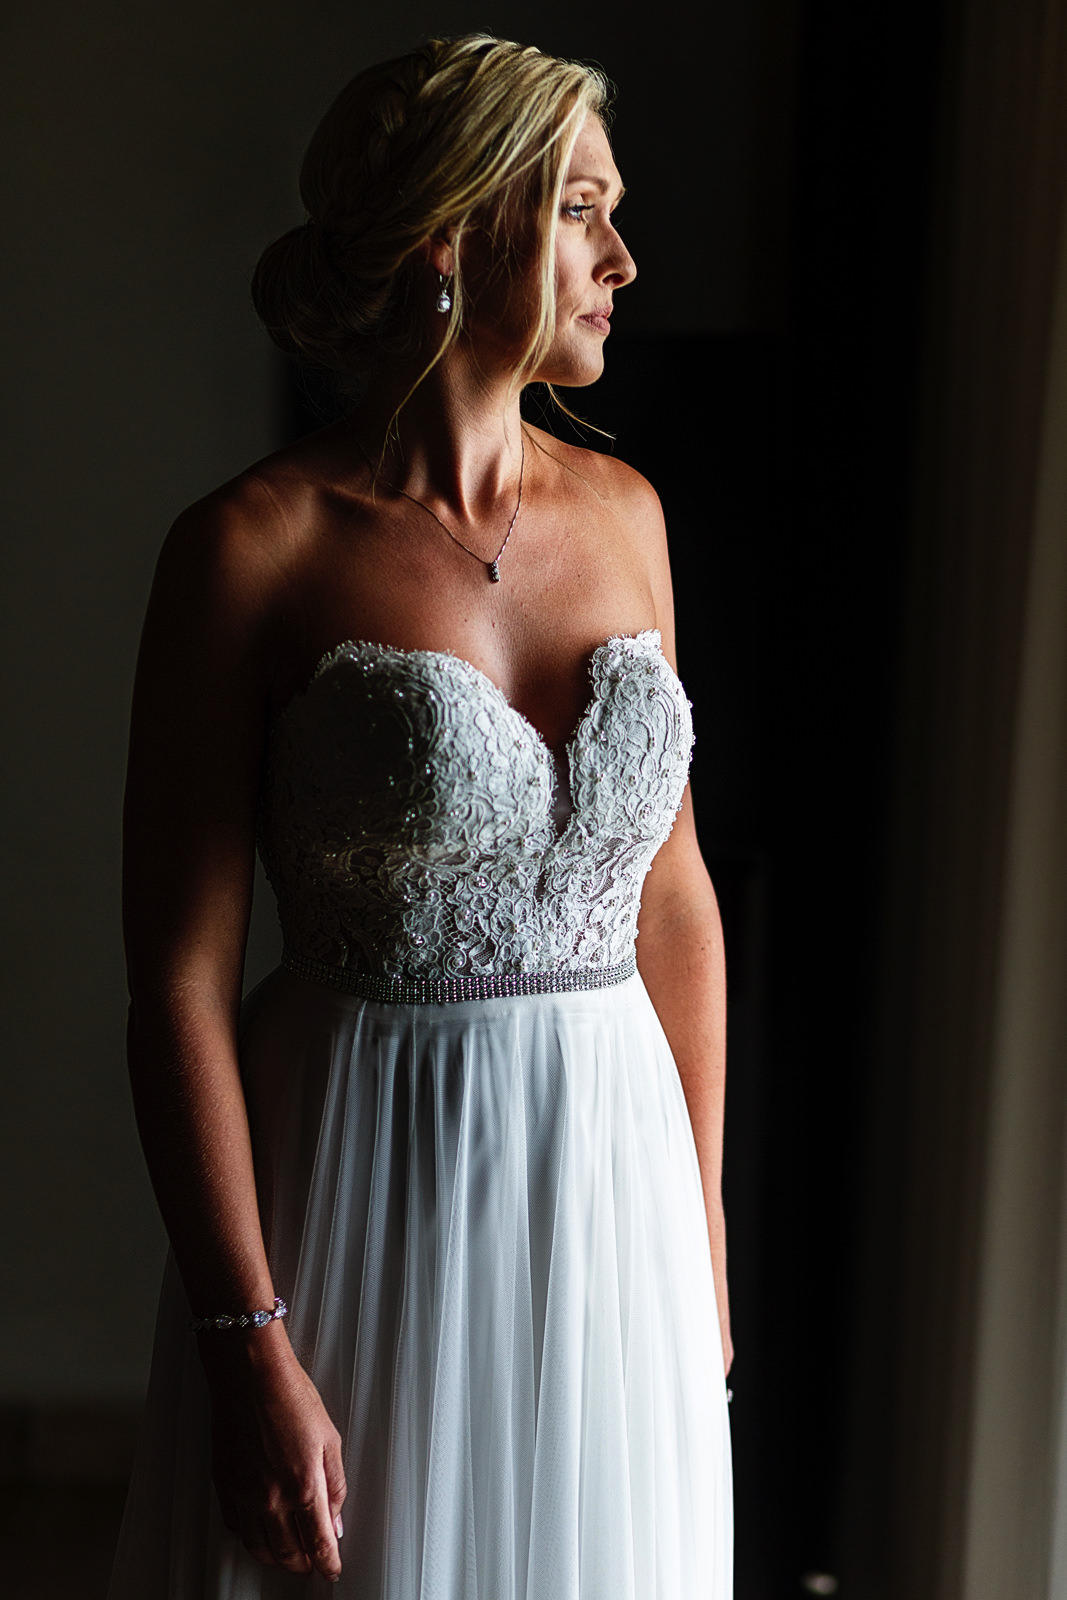 Bride's portrait standing close to a window